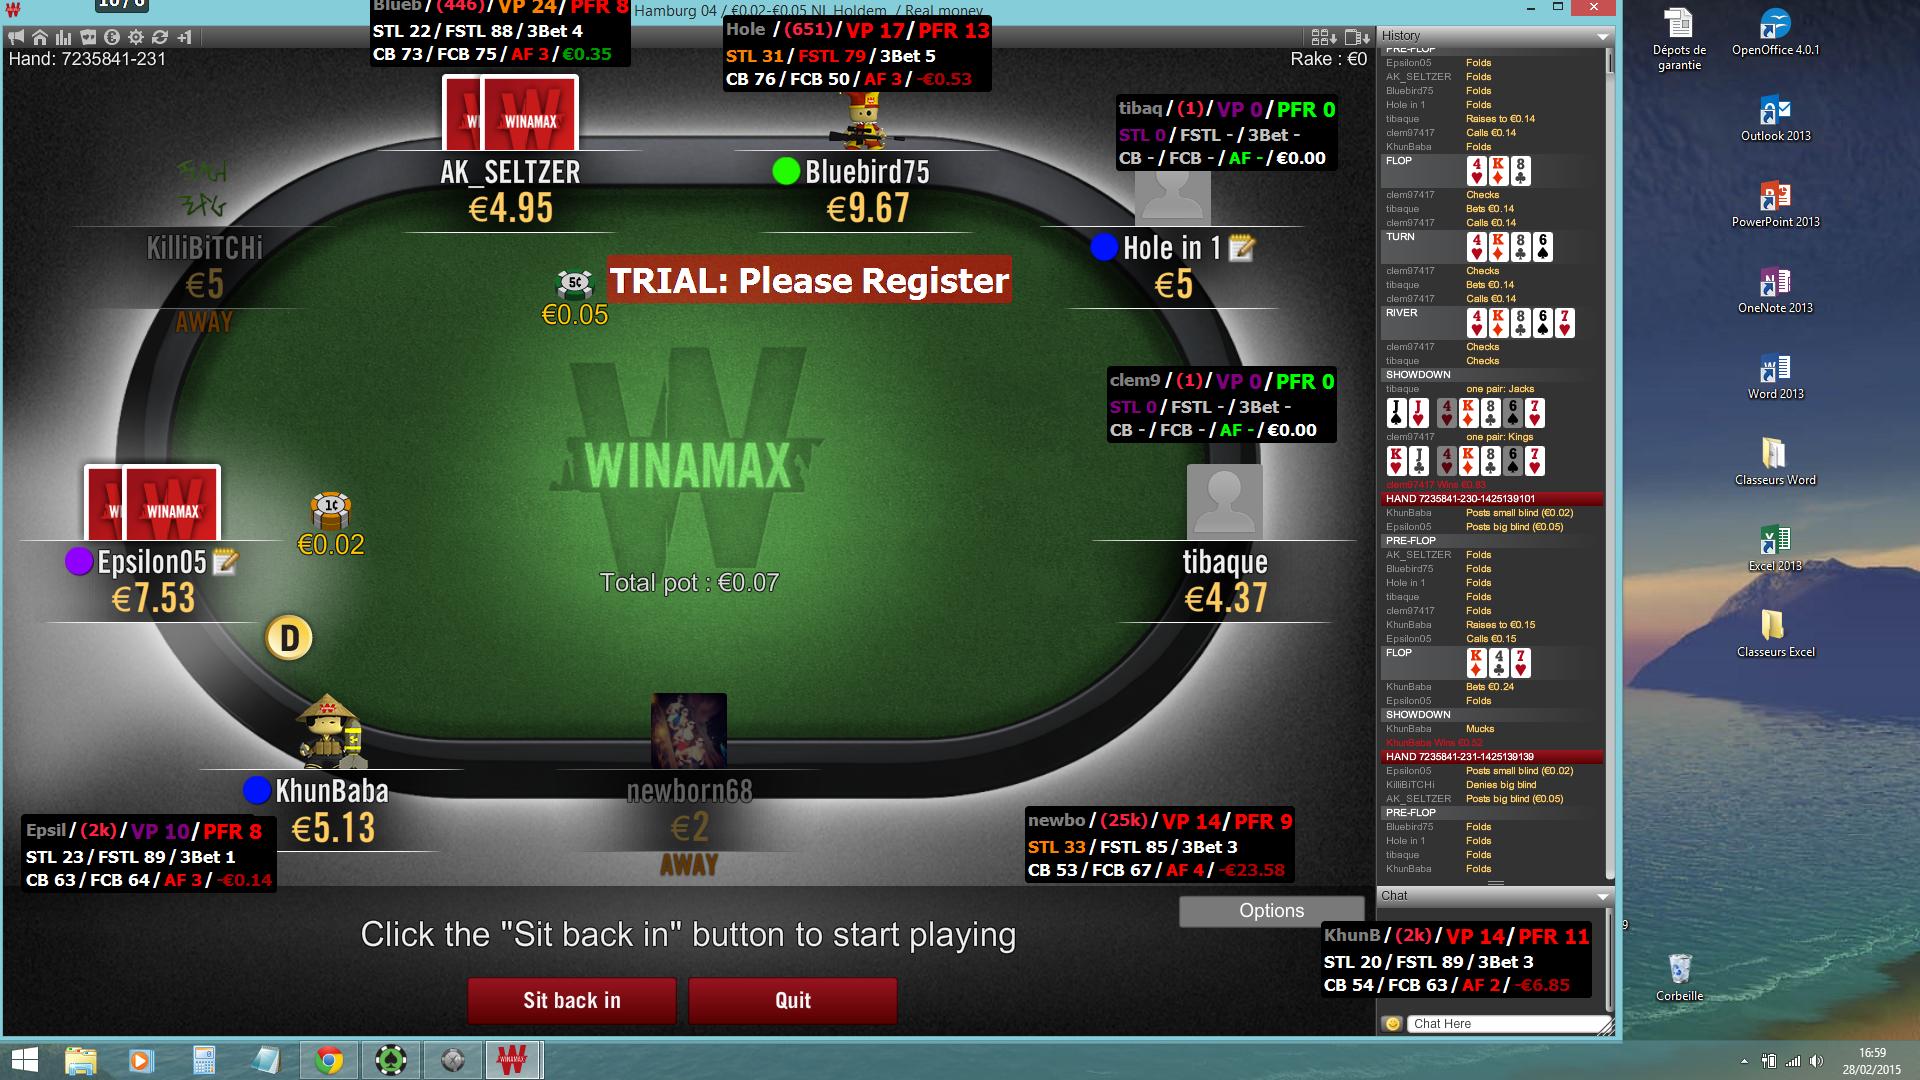 Hud poker tracker winamax hard rock hotel and casino tulsa